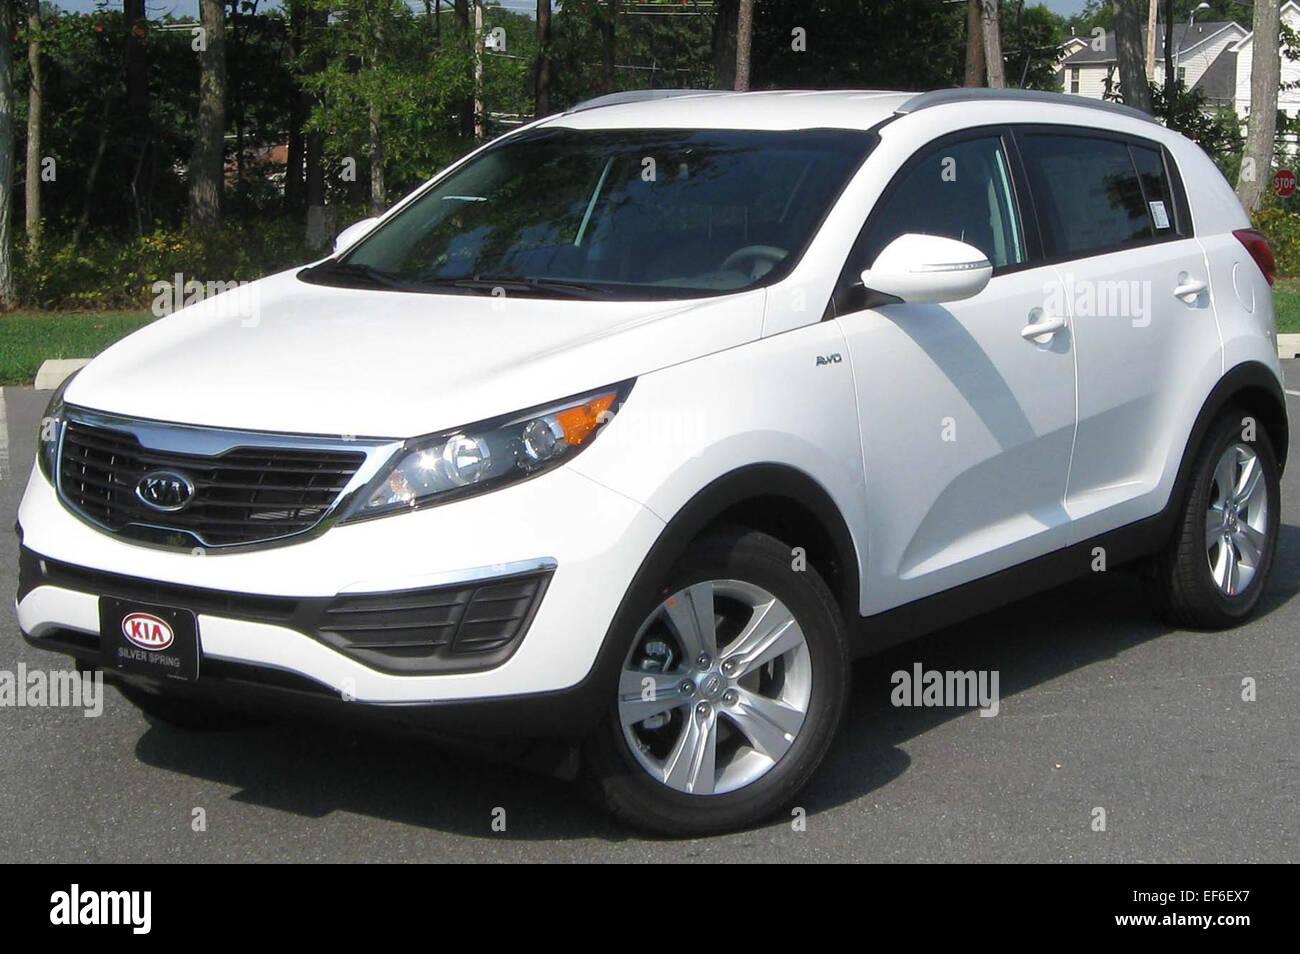 Kia Sportage Stock Photos Images Alamy Car Dashboard 08 2011 Lx 16 2010 Image